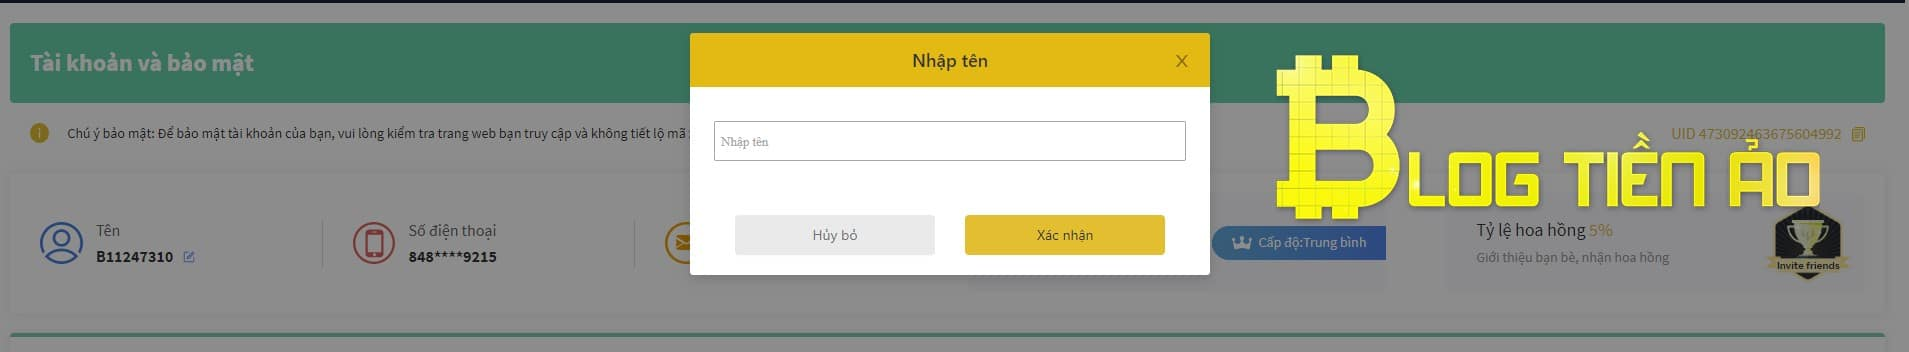 Sửa đổi username nhận 1 USDT